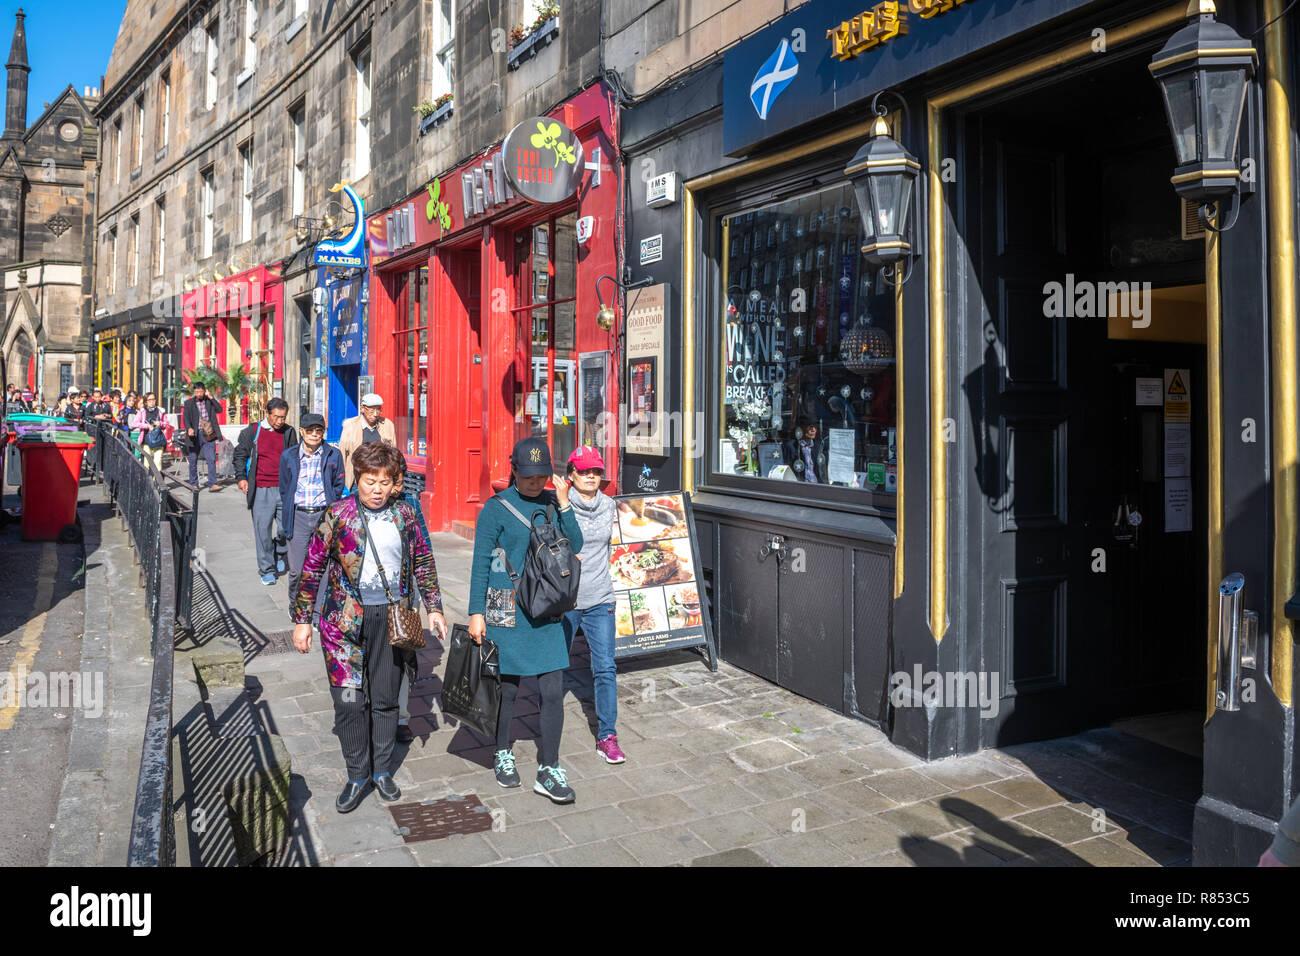 Asian tourists wander along an Edinburgh street after exploring and shopping throughout the city, Scotland, UK. - Stock Image